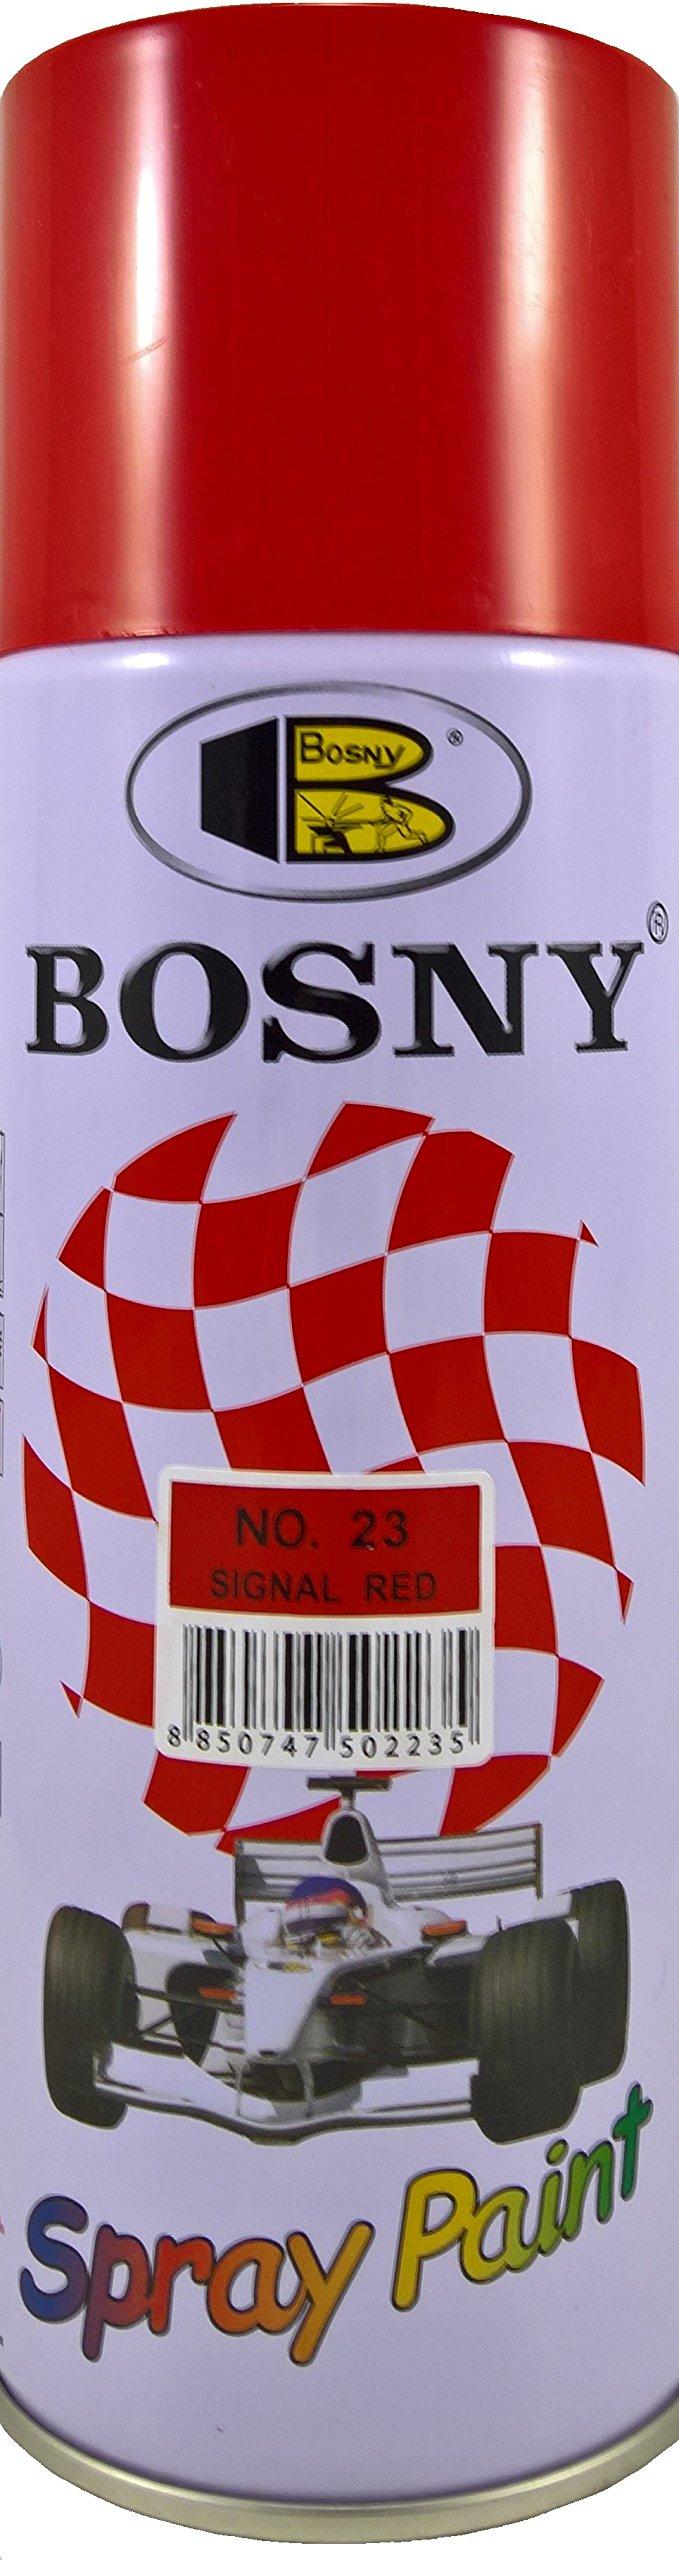 Bosny Acrylic Aerosol Spray Paint (400 ml, Signal Red) product image